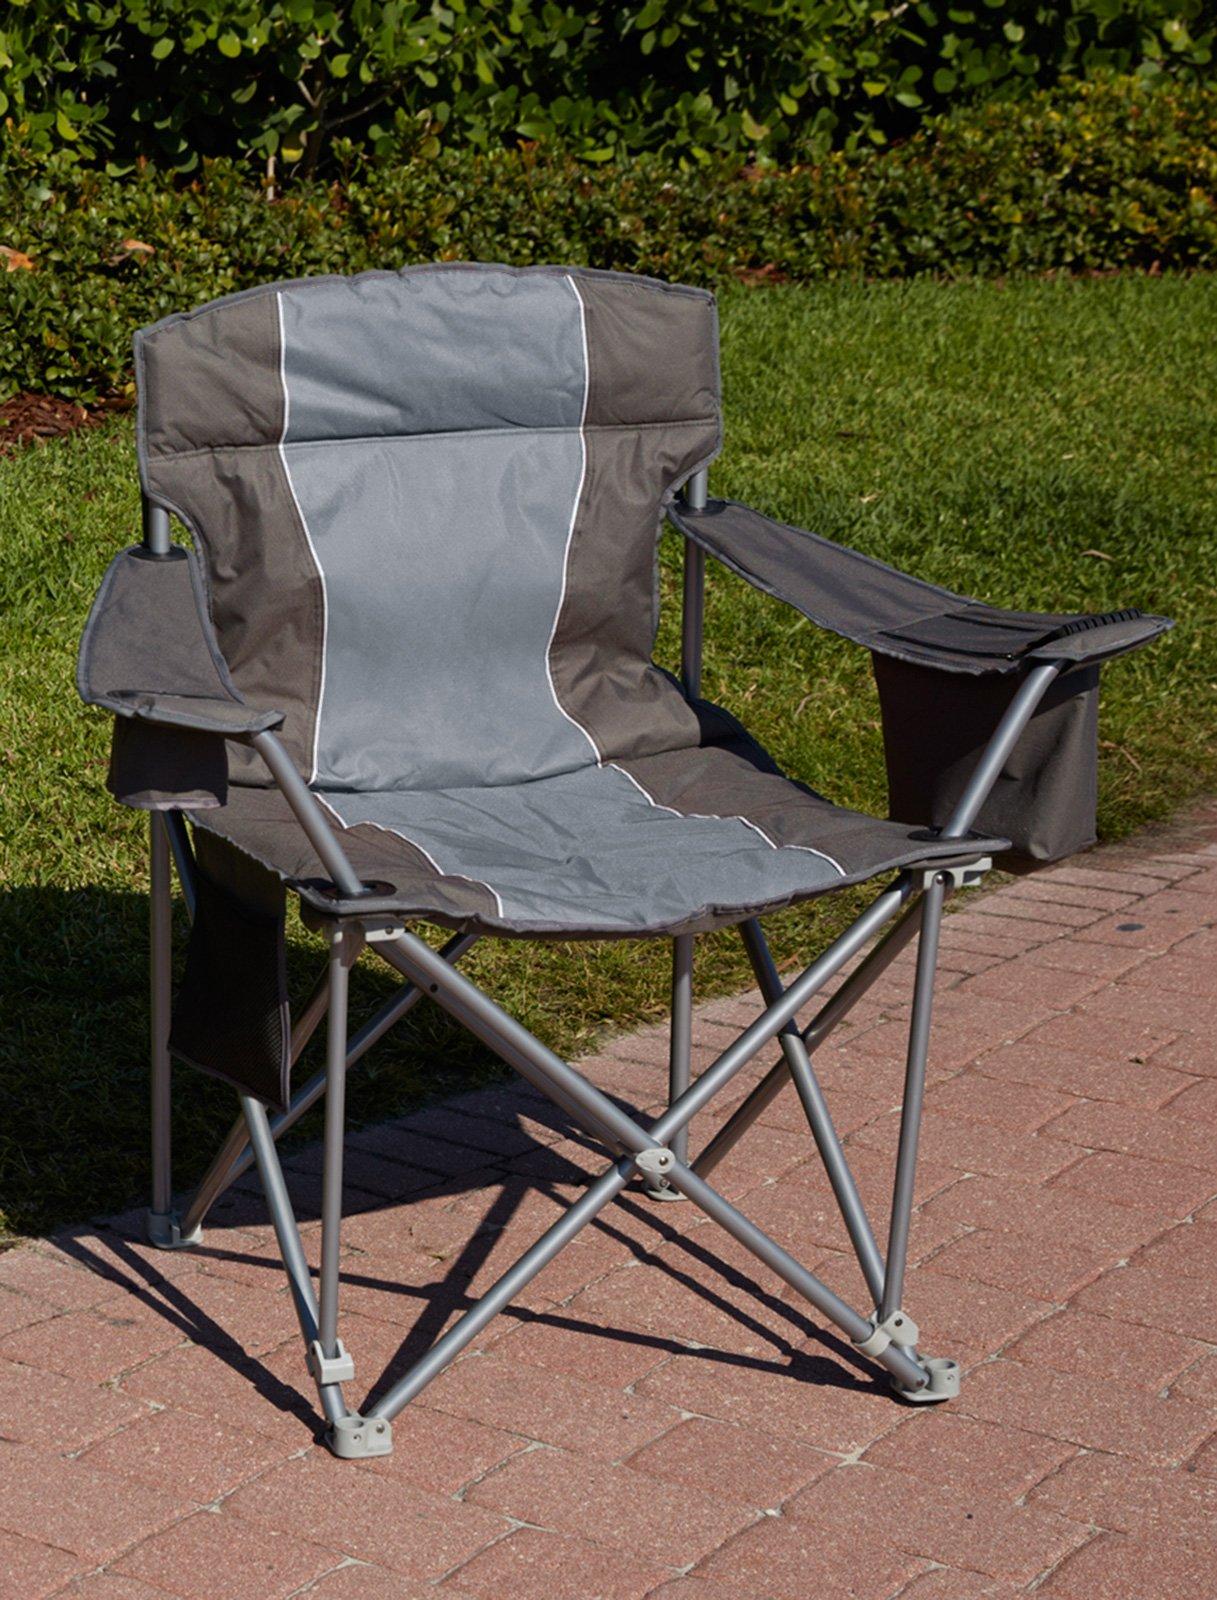 1,000-lb. Capacity Heavy-Duty Portable Chair (Charcoal)